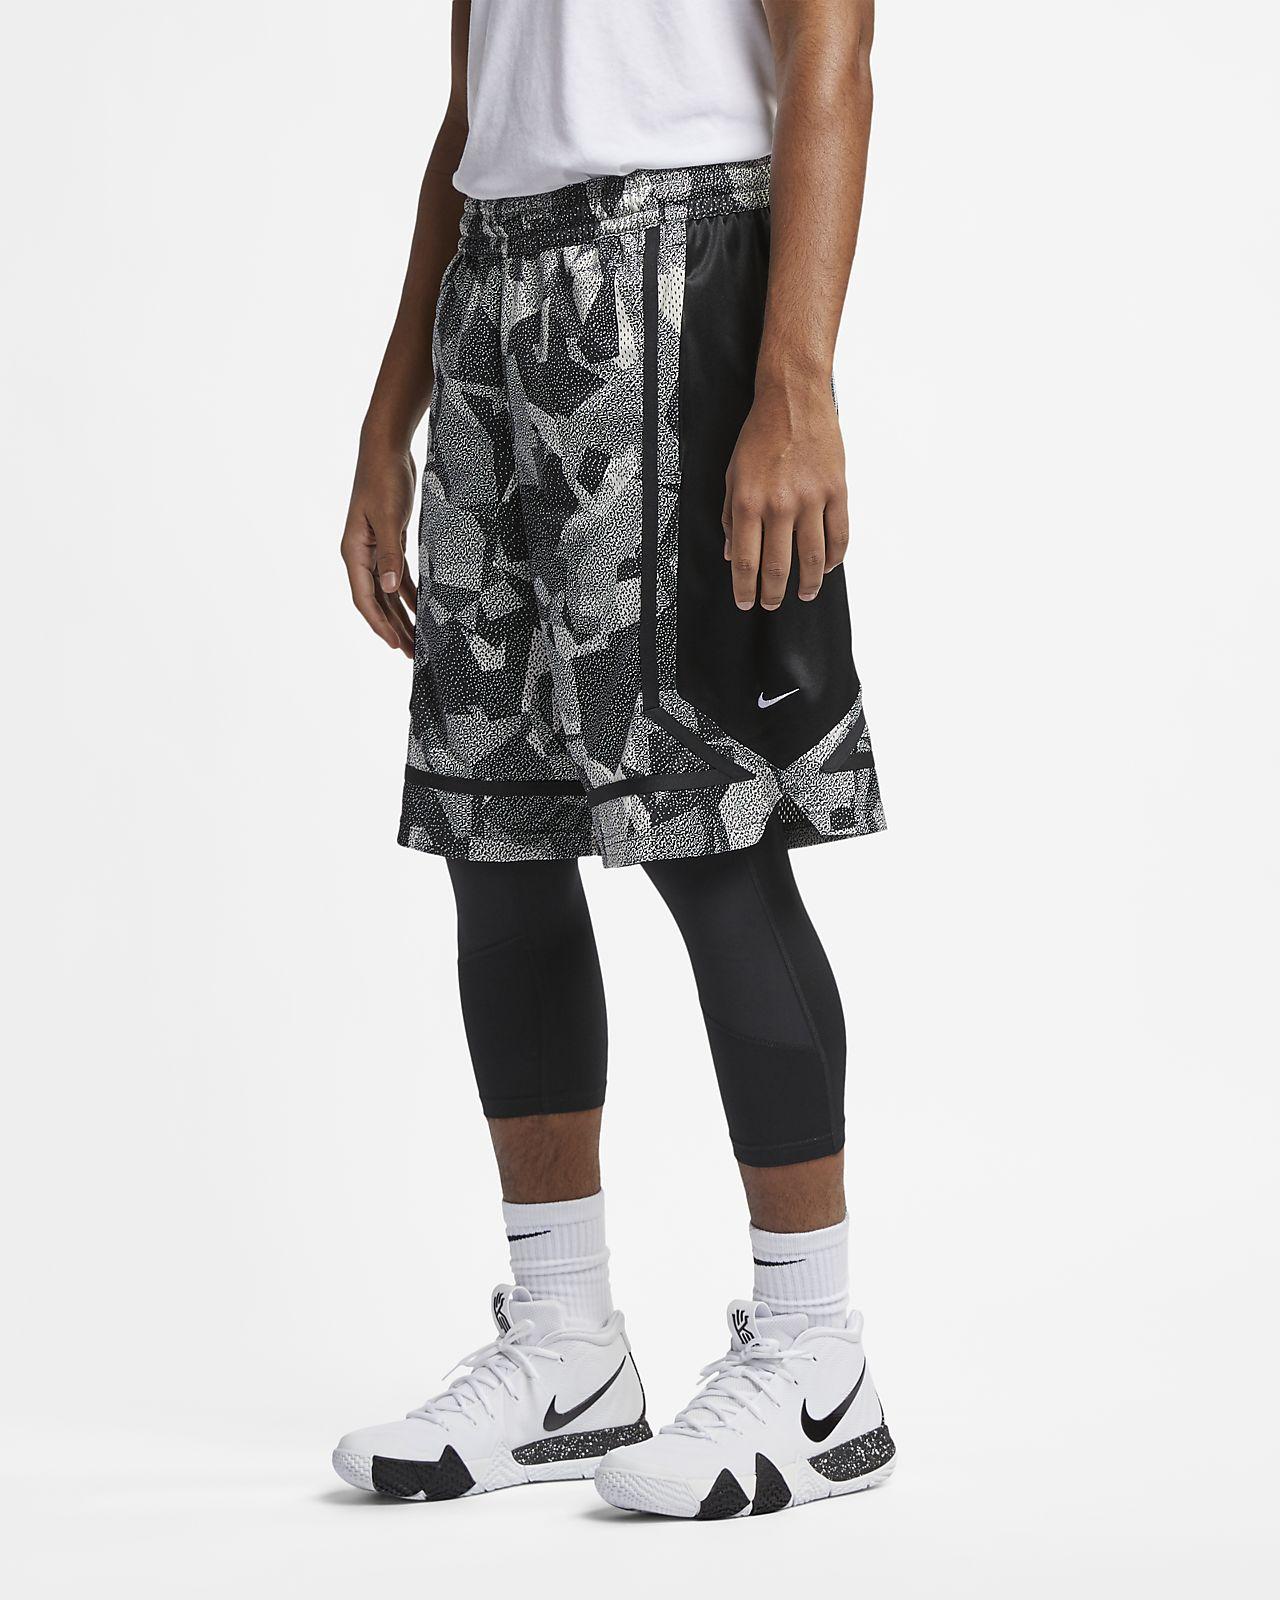 Kyrie Dri-FIT Elite Men's Basketball Shorts